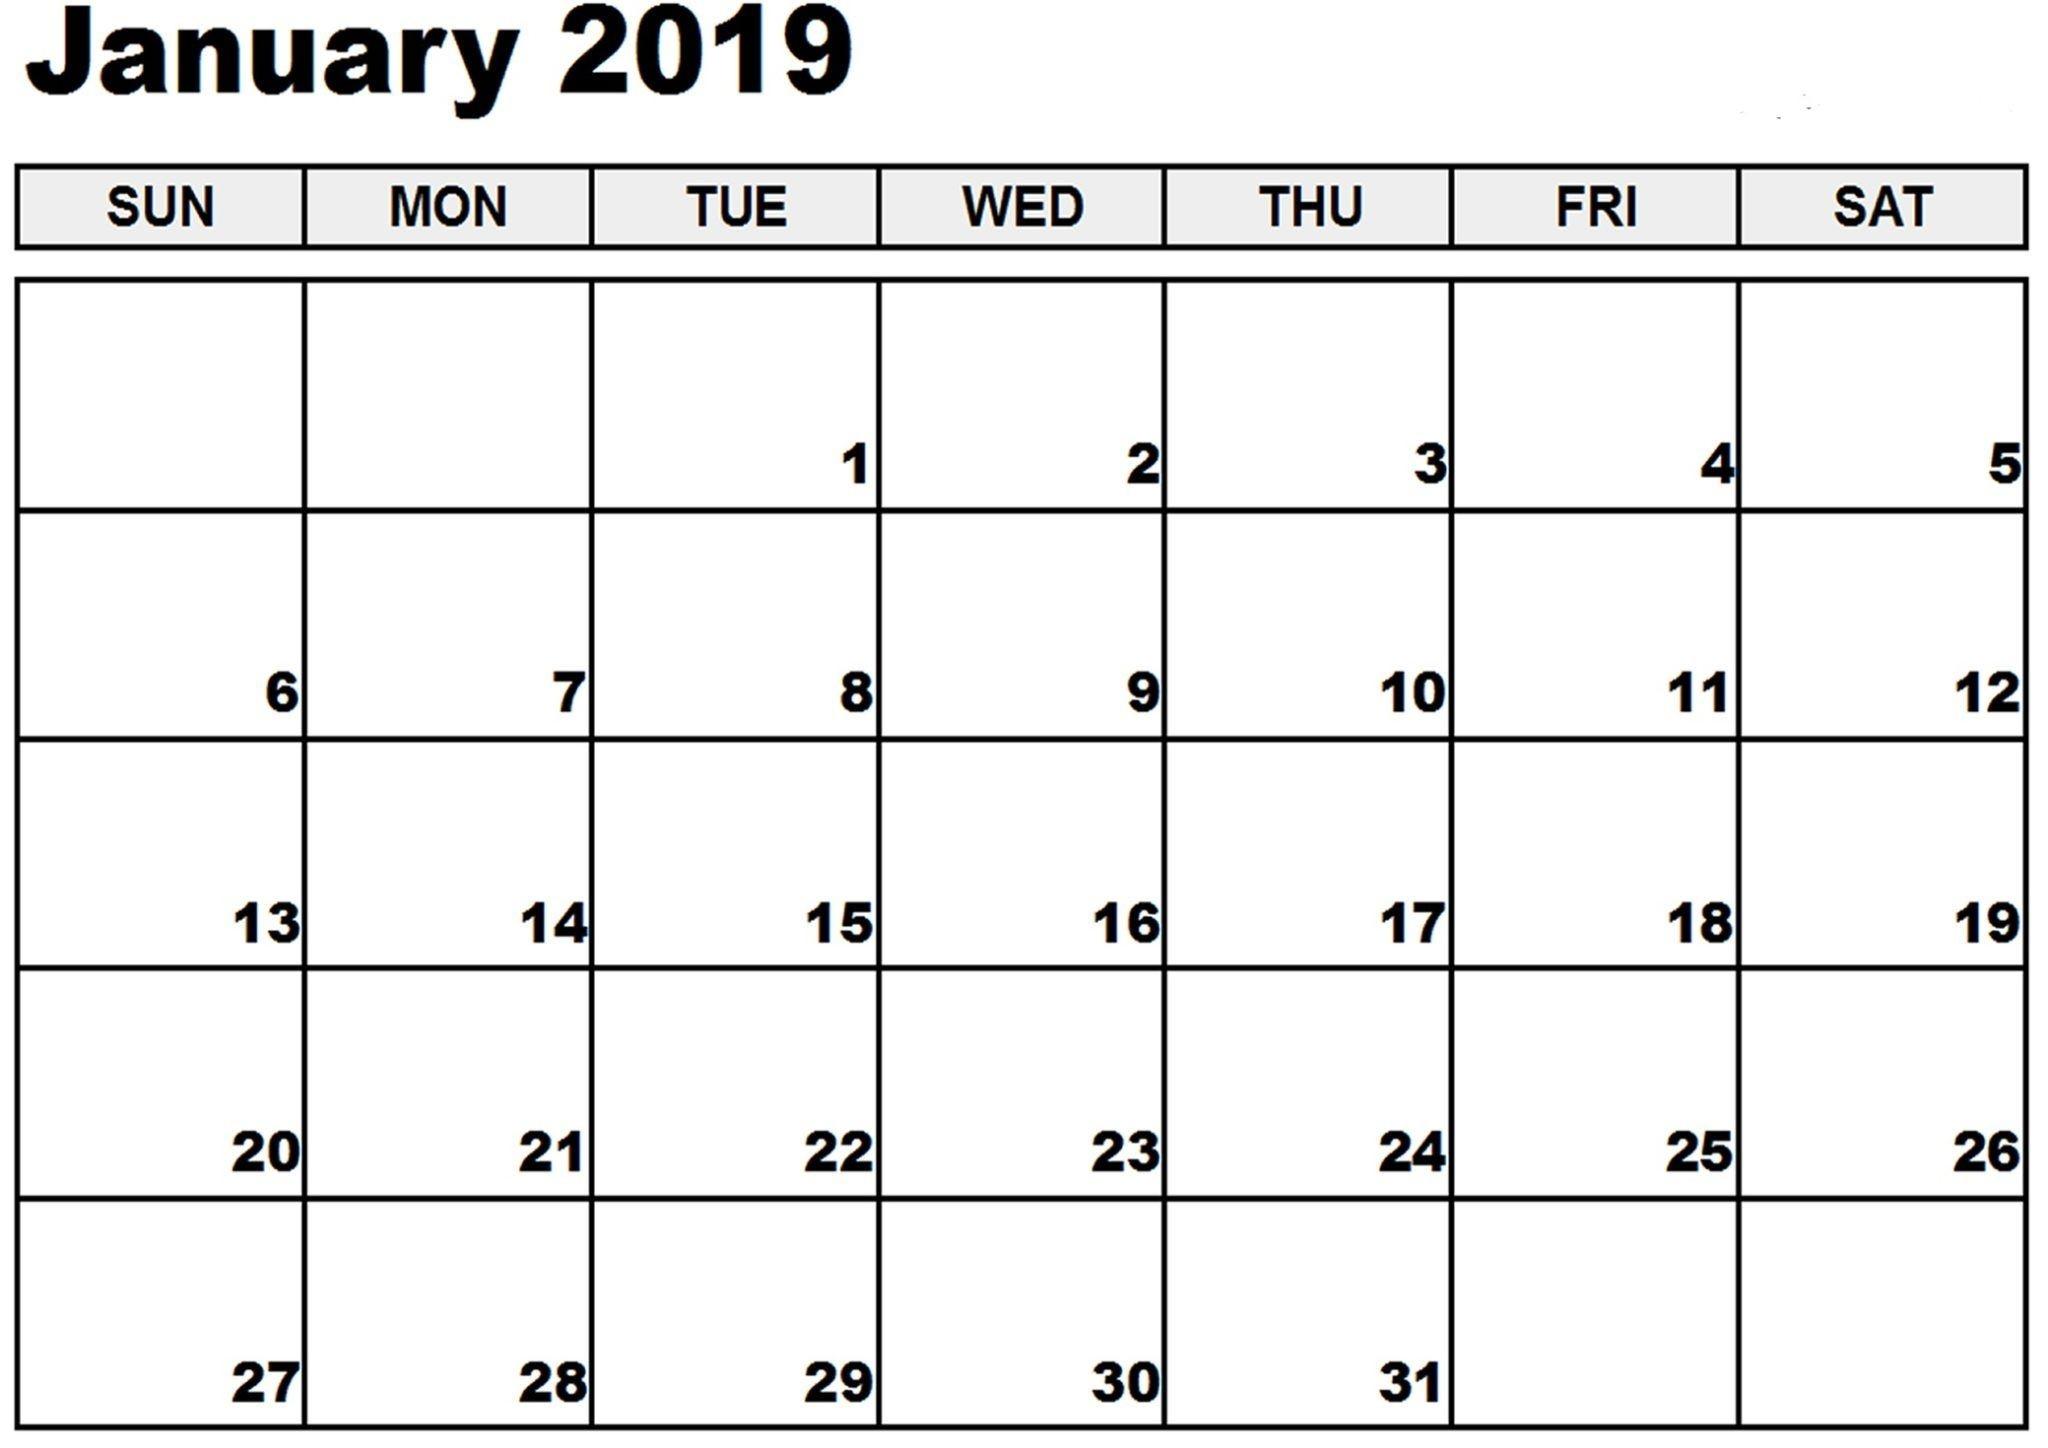 January 2019 Calendar South Africa Blank Template | 555 Free-Calendar Template South Africa